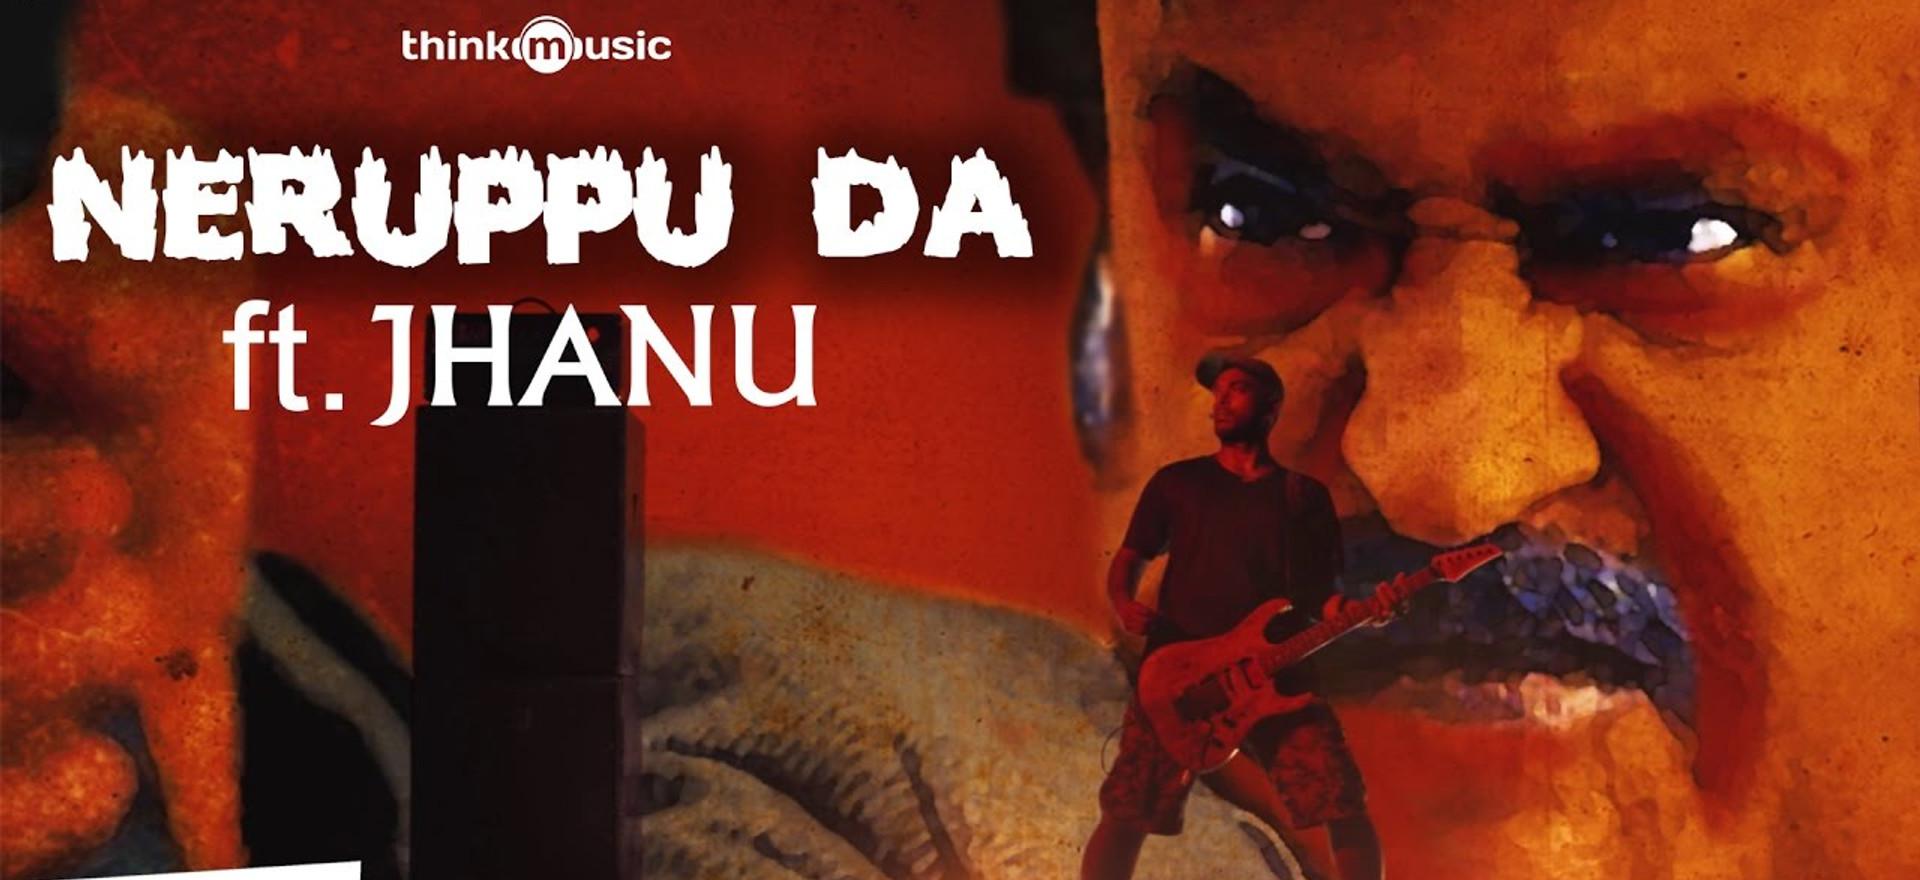 Kabali | Neruppu Da Feat. JHANU | Music Video